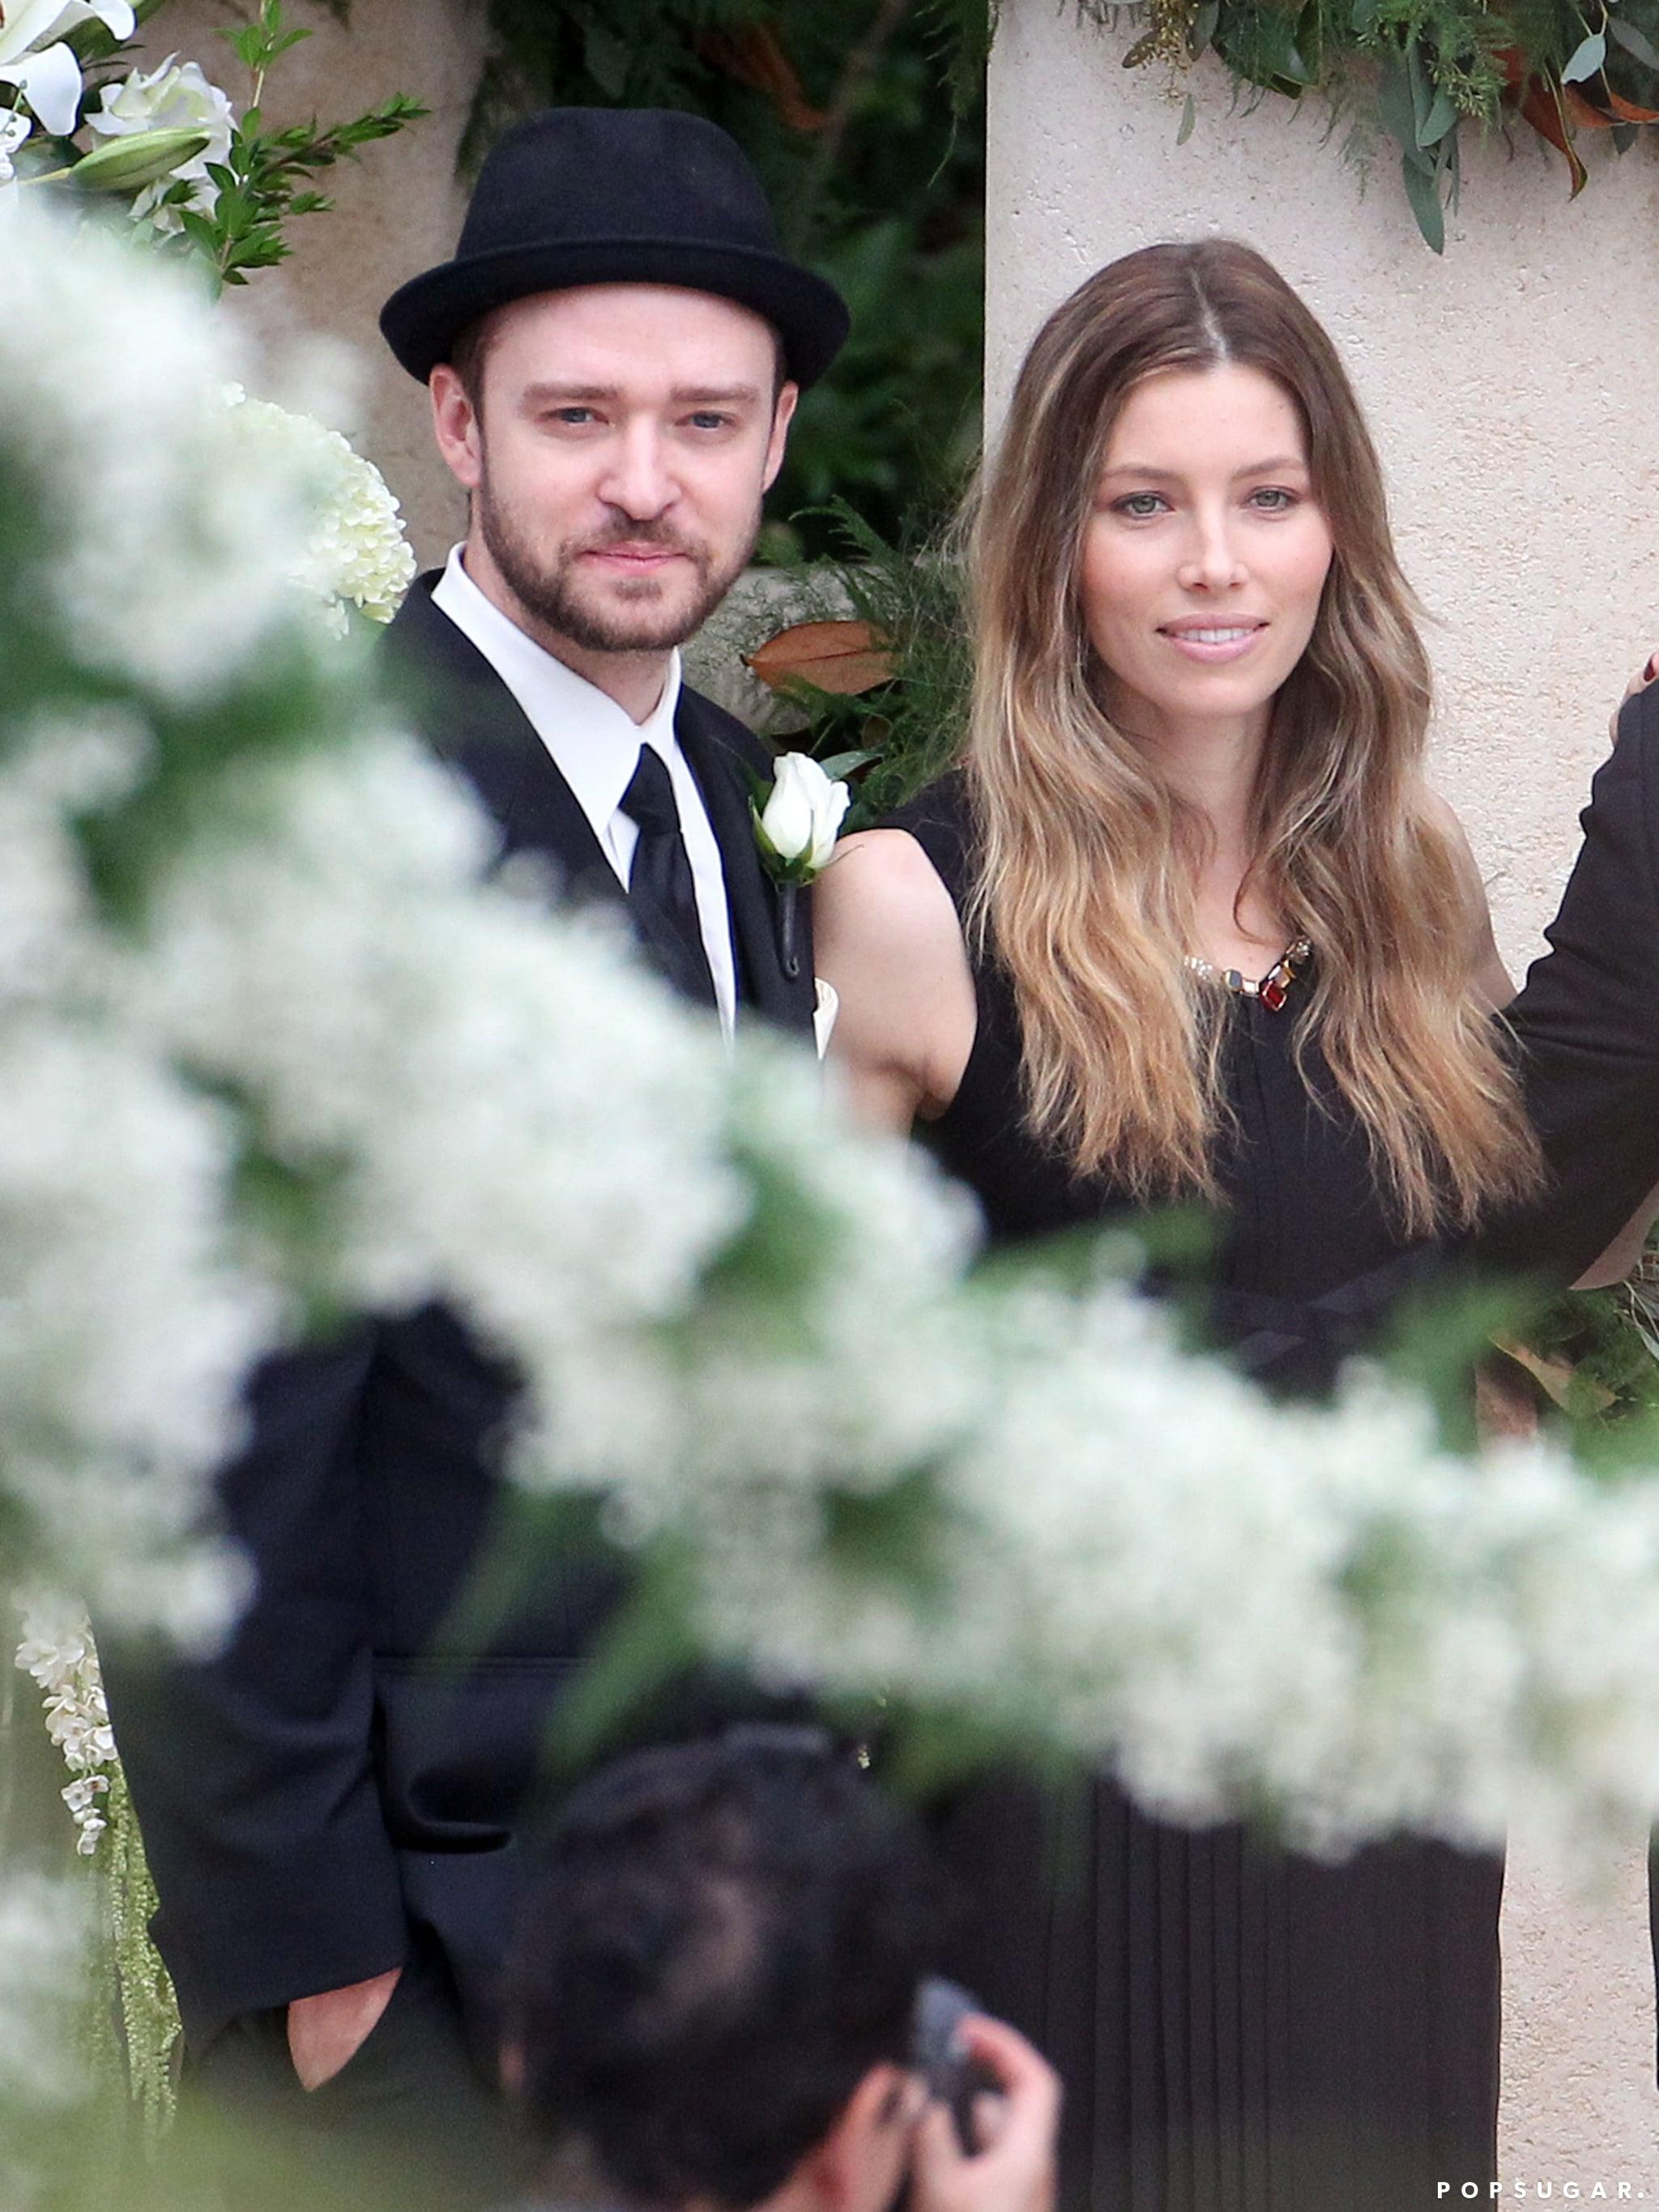 Justin Timberlake and Jessica Biel attended Chris Kirkpatrick's wedding.